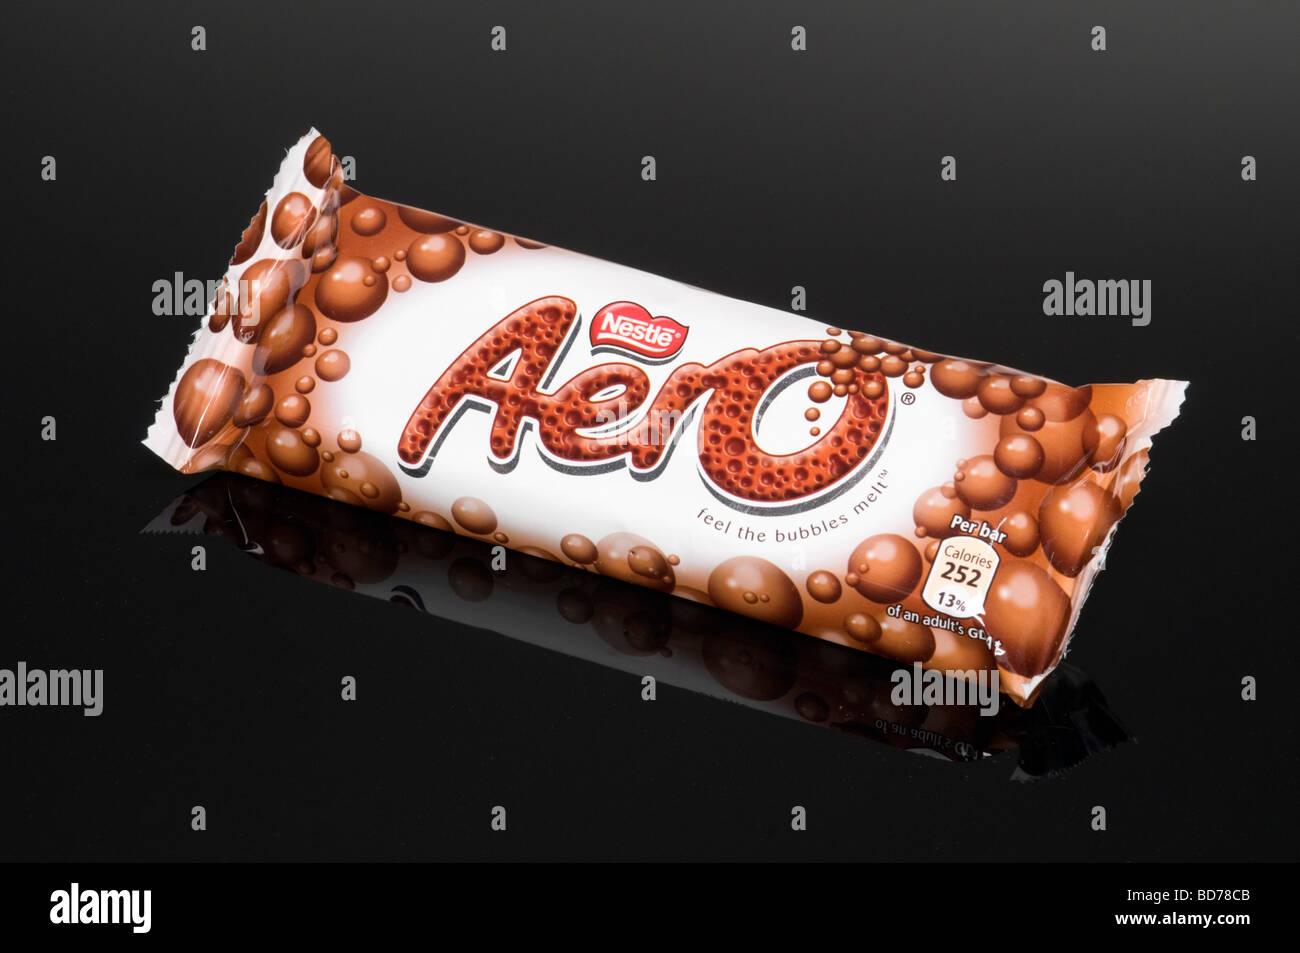 Nestle Aero Chocolate Bar On Black Background Shot In Studio - Stock Image